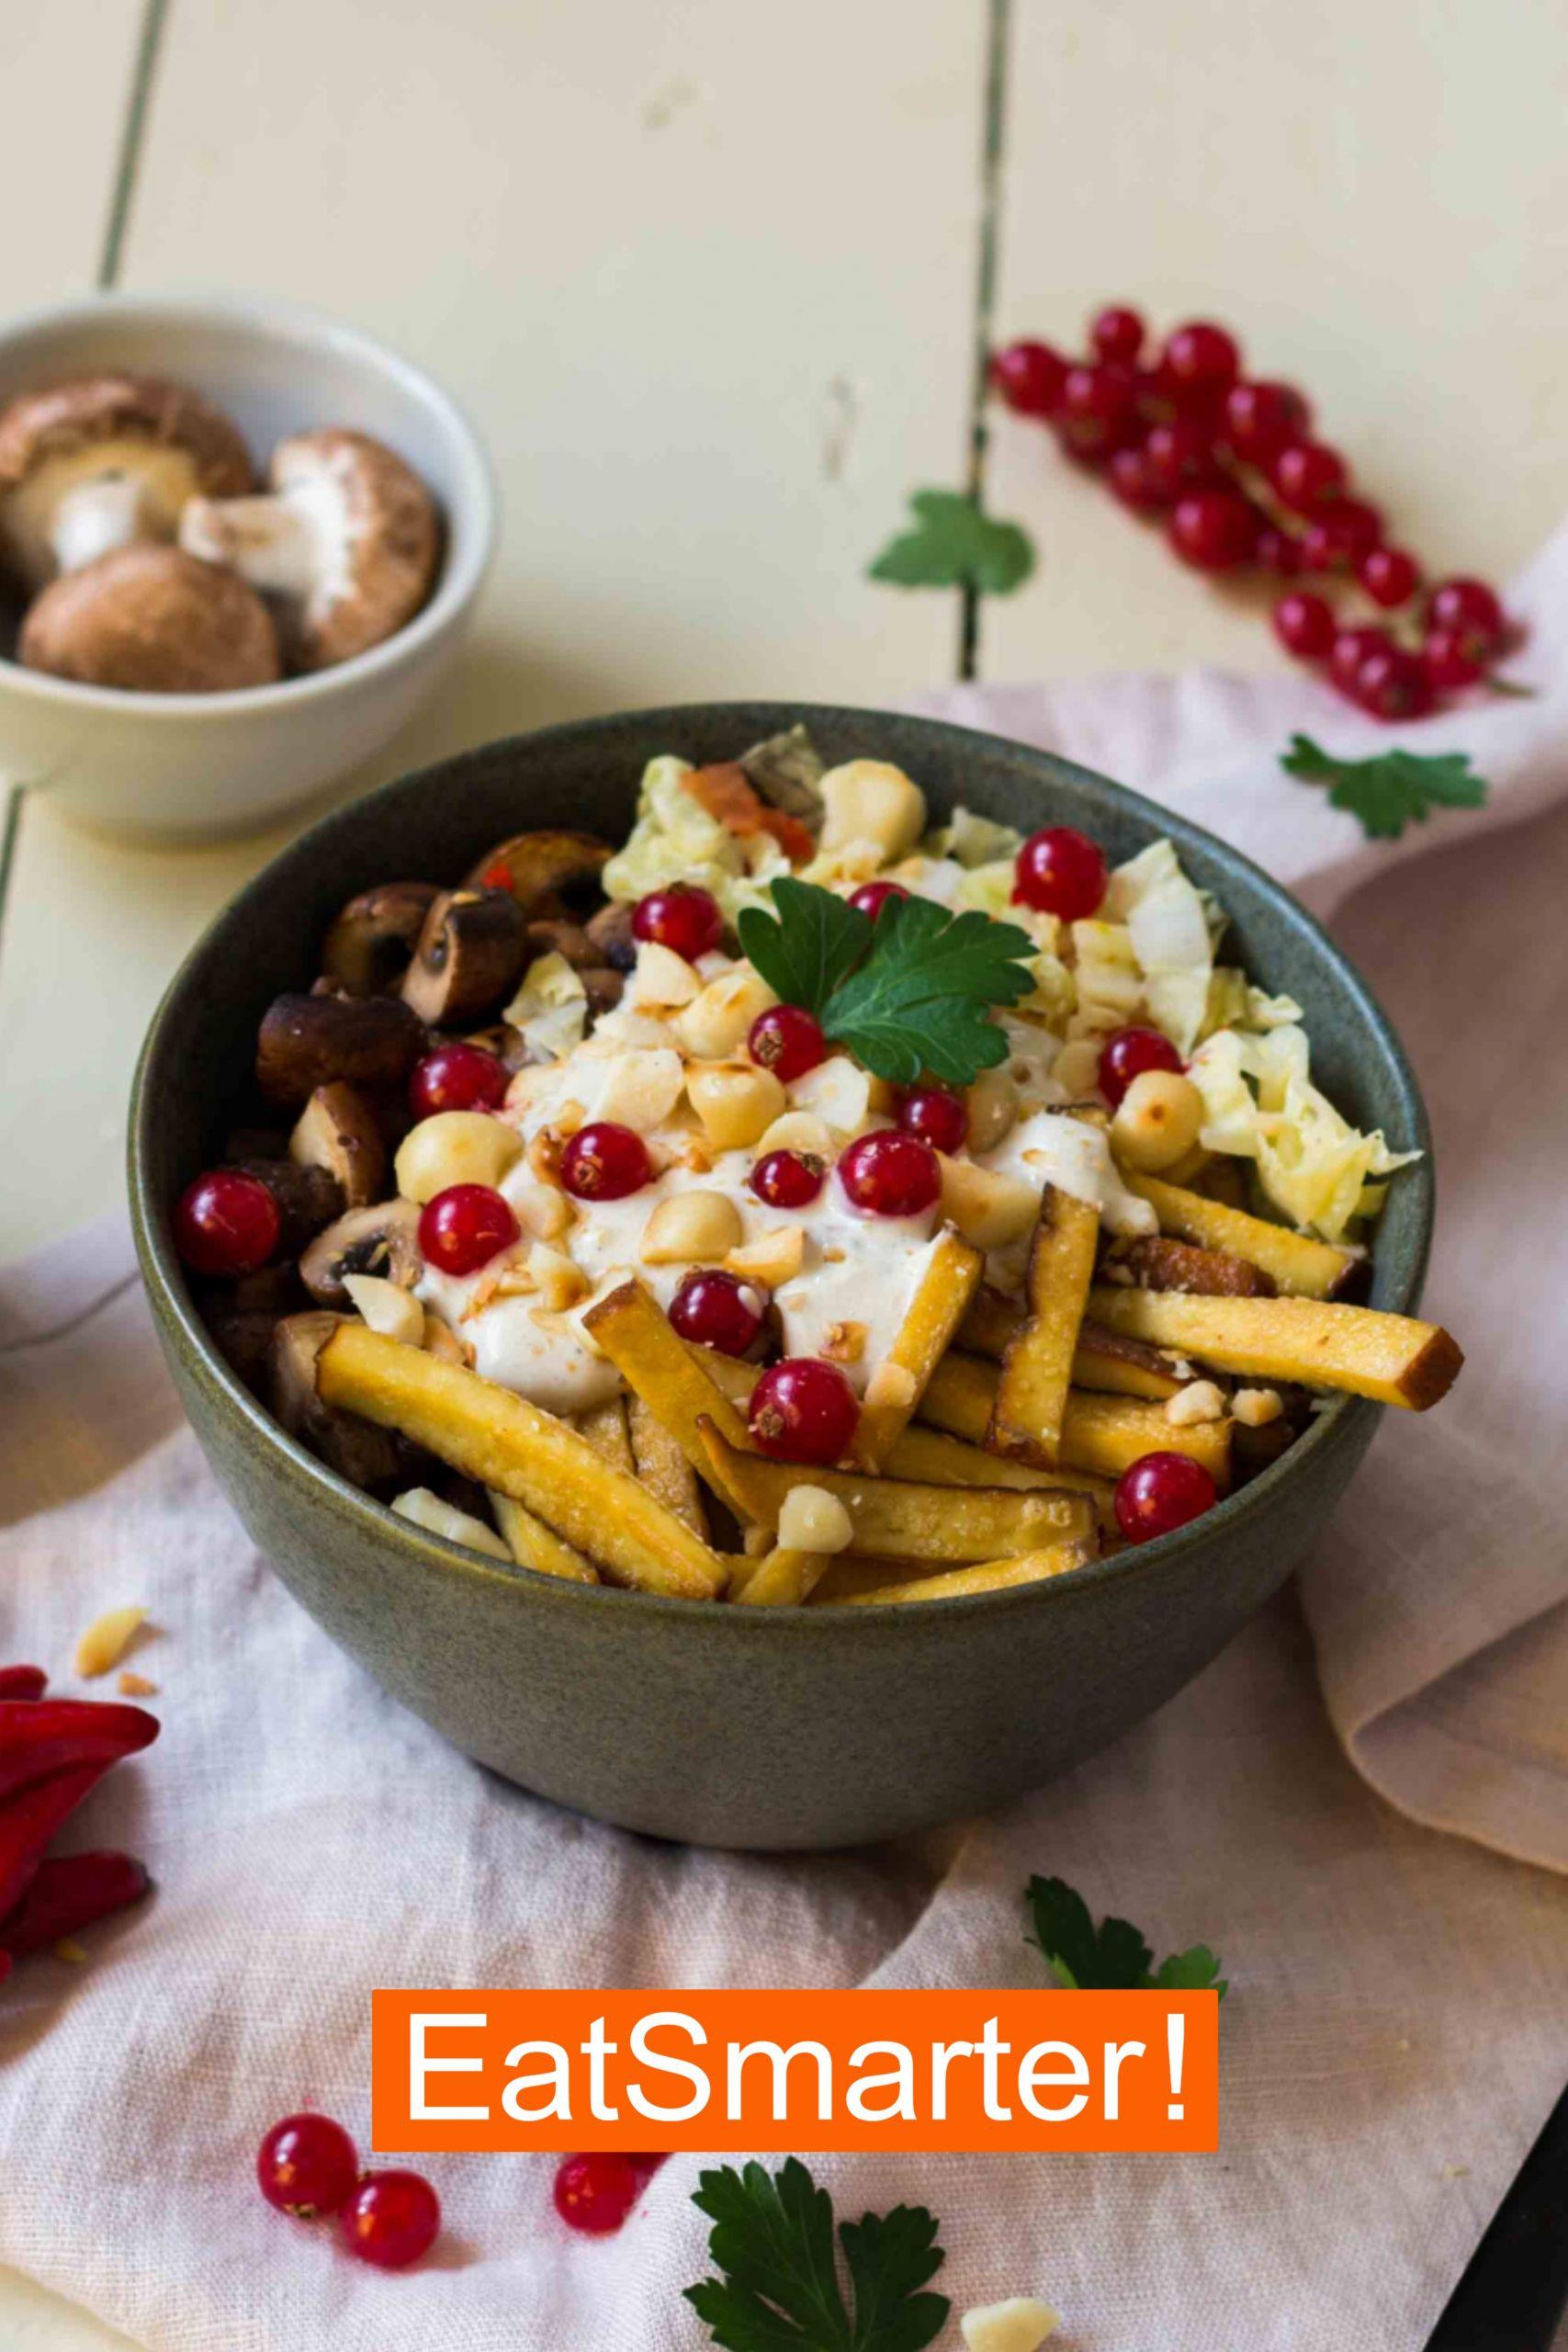 Low Carb Keto Rezepte Deutsch  Keto Bowl mit Pilzen und Chinakohl